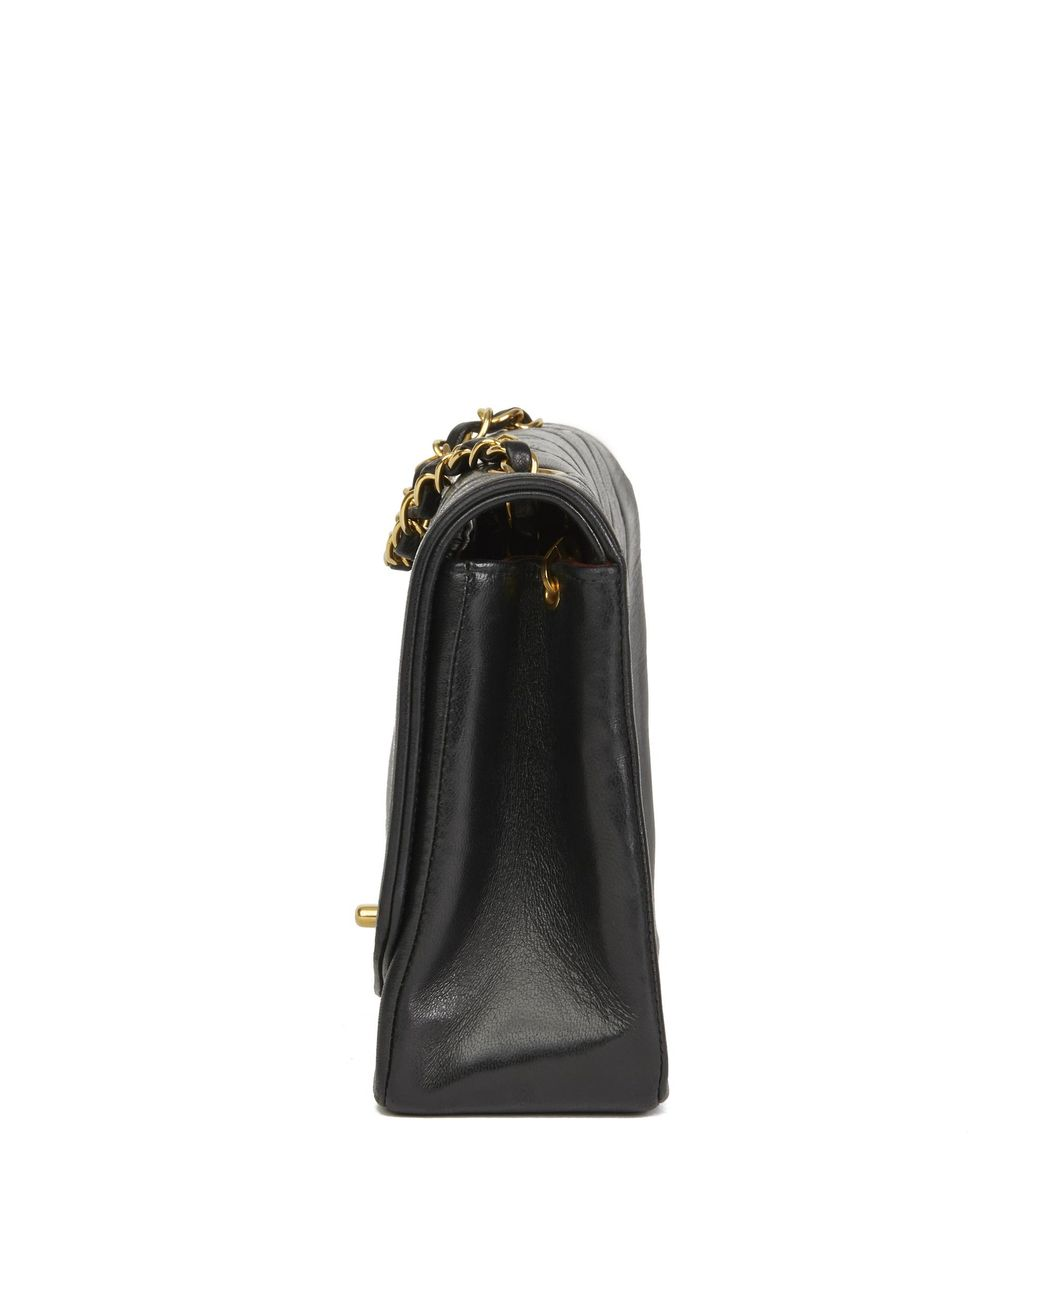 fc80edbdf791 Lyst - Chanel Black Quilted Lambskin Vintage Medium Diana Classic Single  Flap Bag in Black